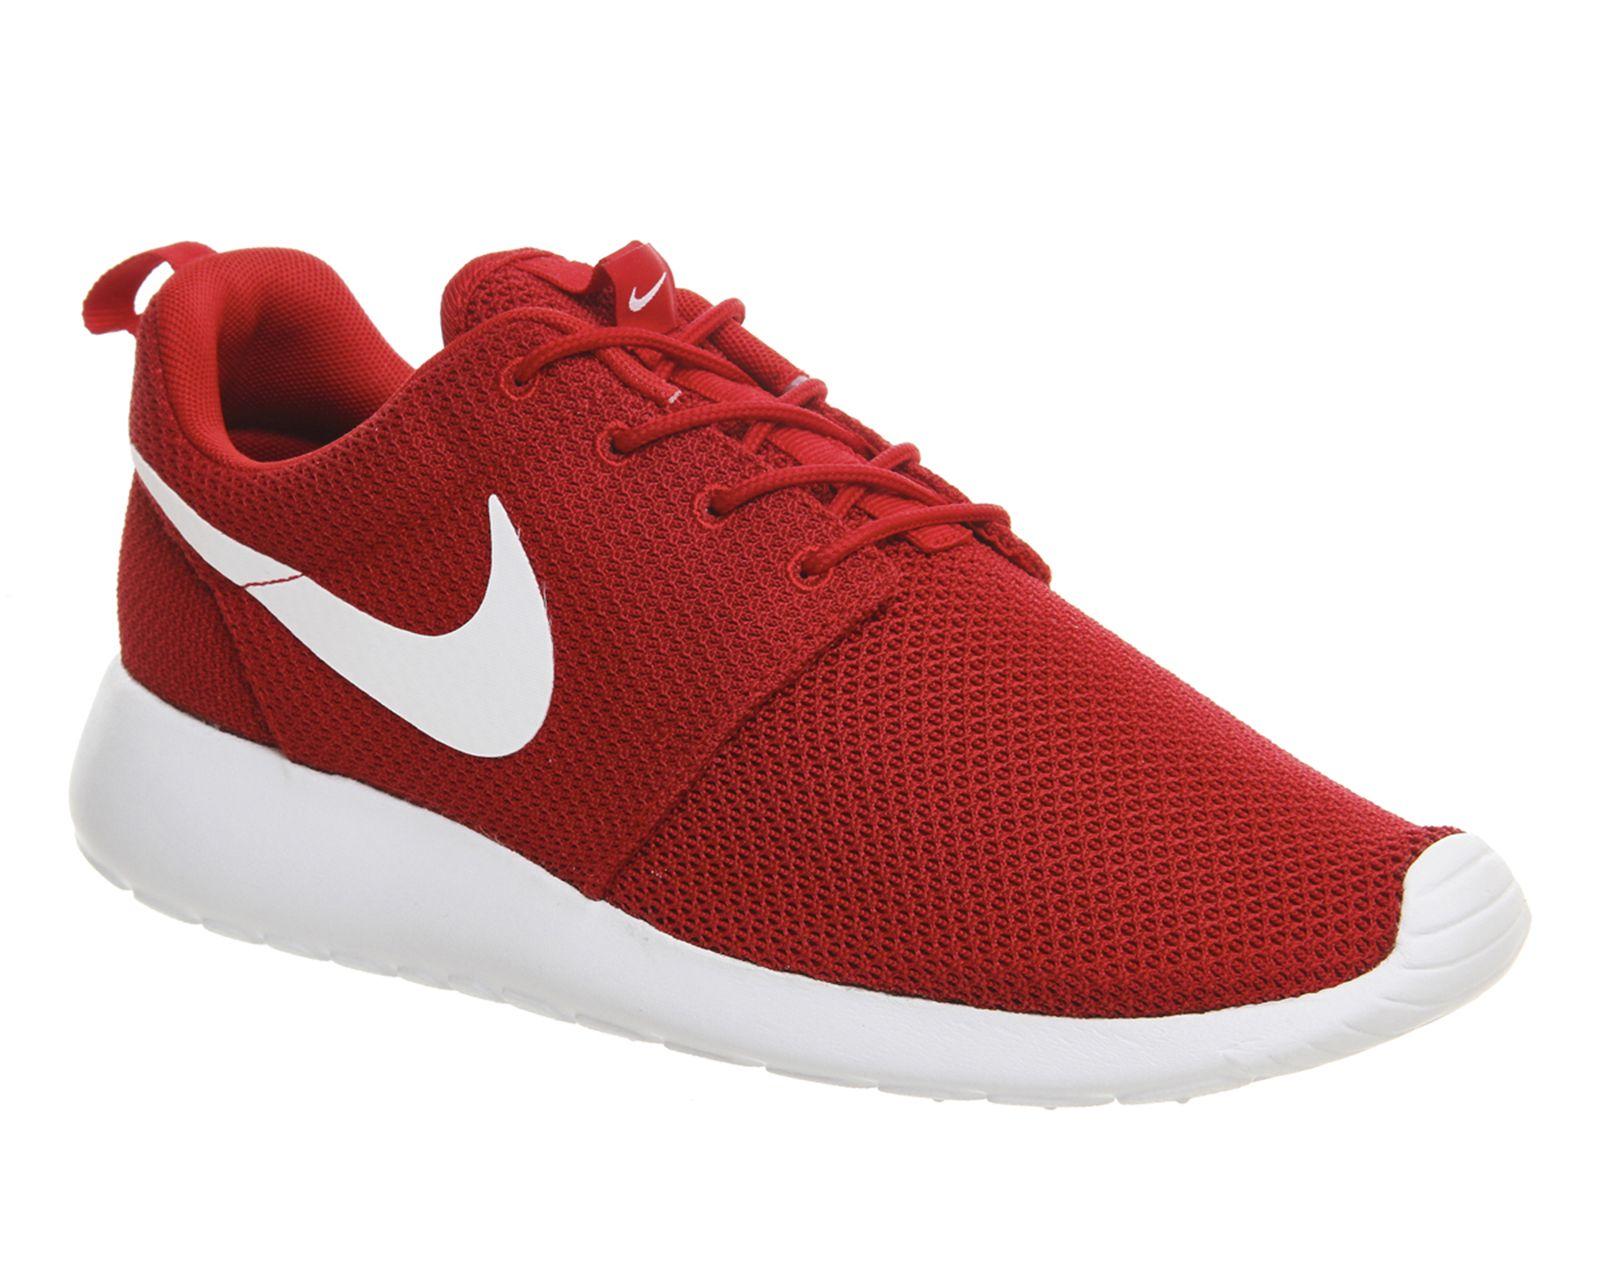 low priced 96680 33b35 Nike Roshe Run Gym Red - Unisex Sports